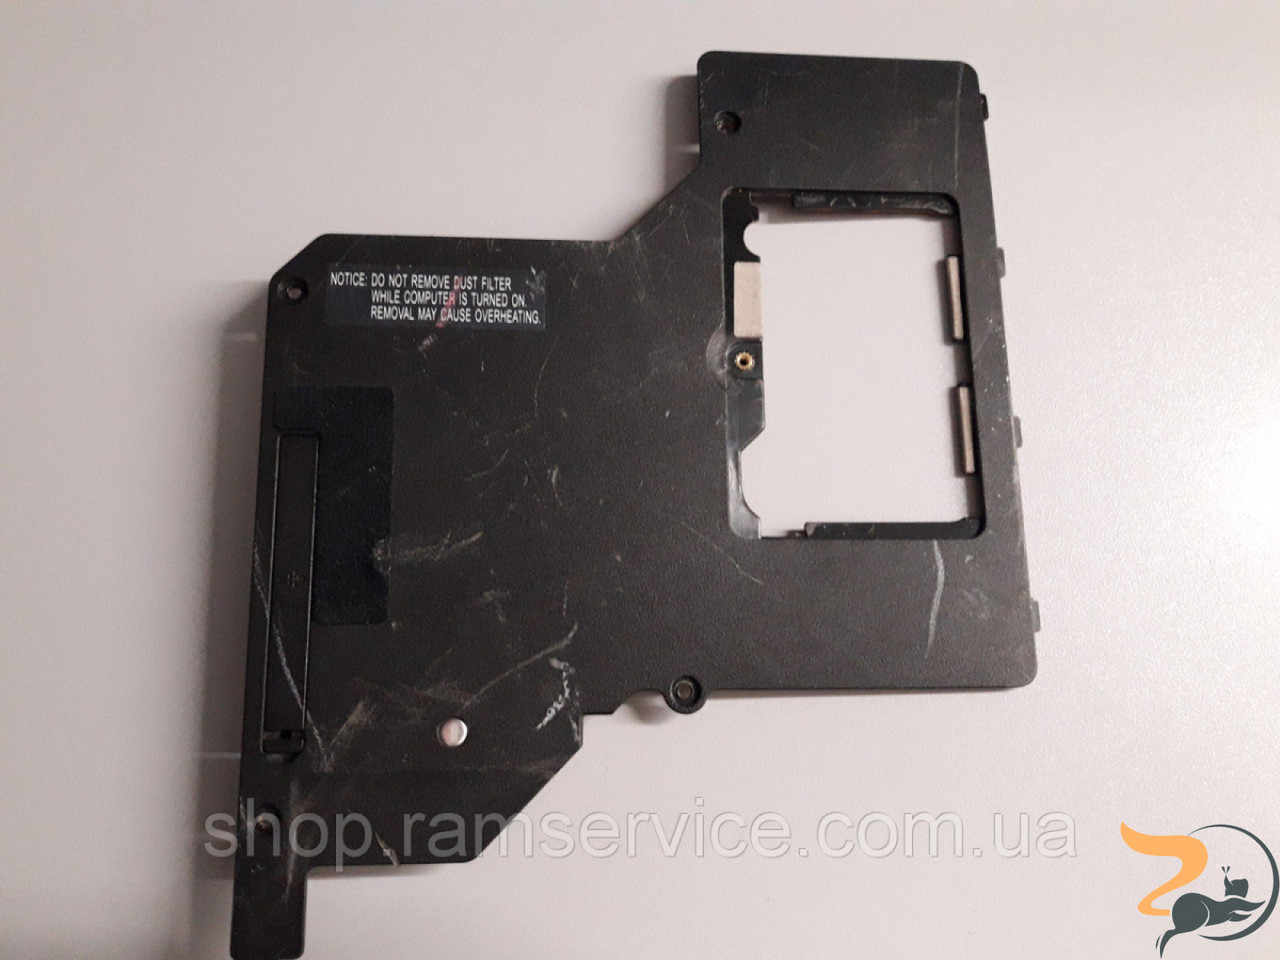 Сервісна кришка для ноутбука Fujitsu LifeBook S7220, б/в